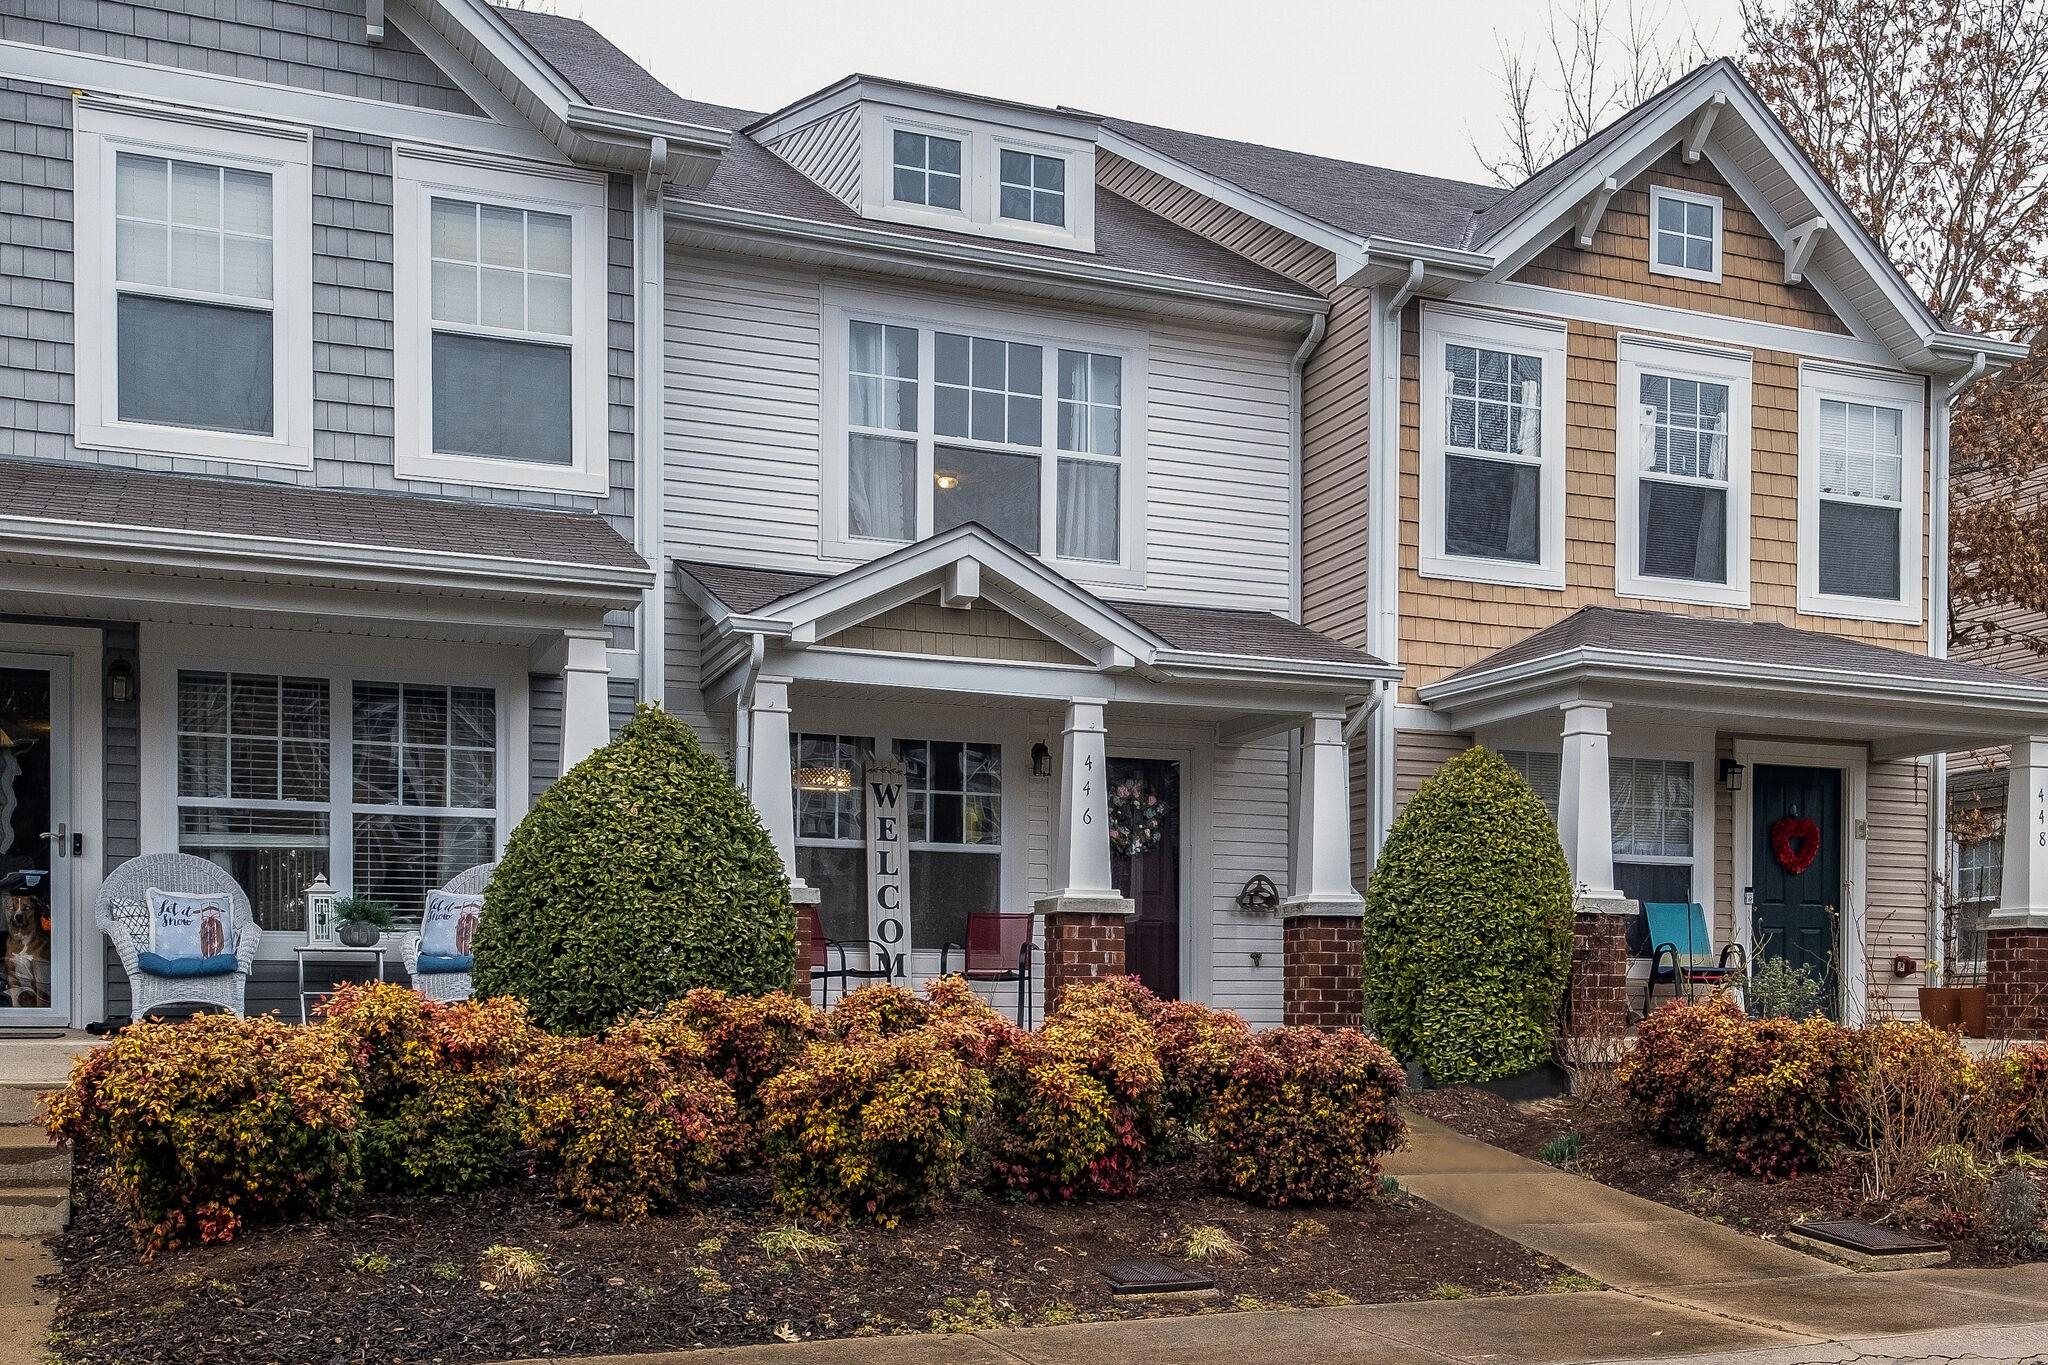 446 Flintlock Ct Property Photo - Nashville, TN real estate listing